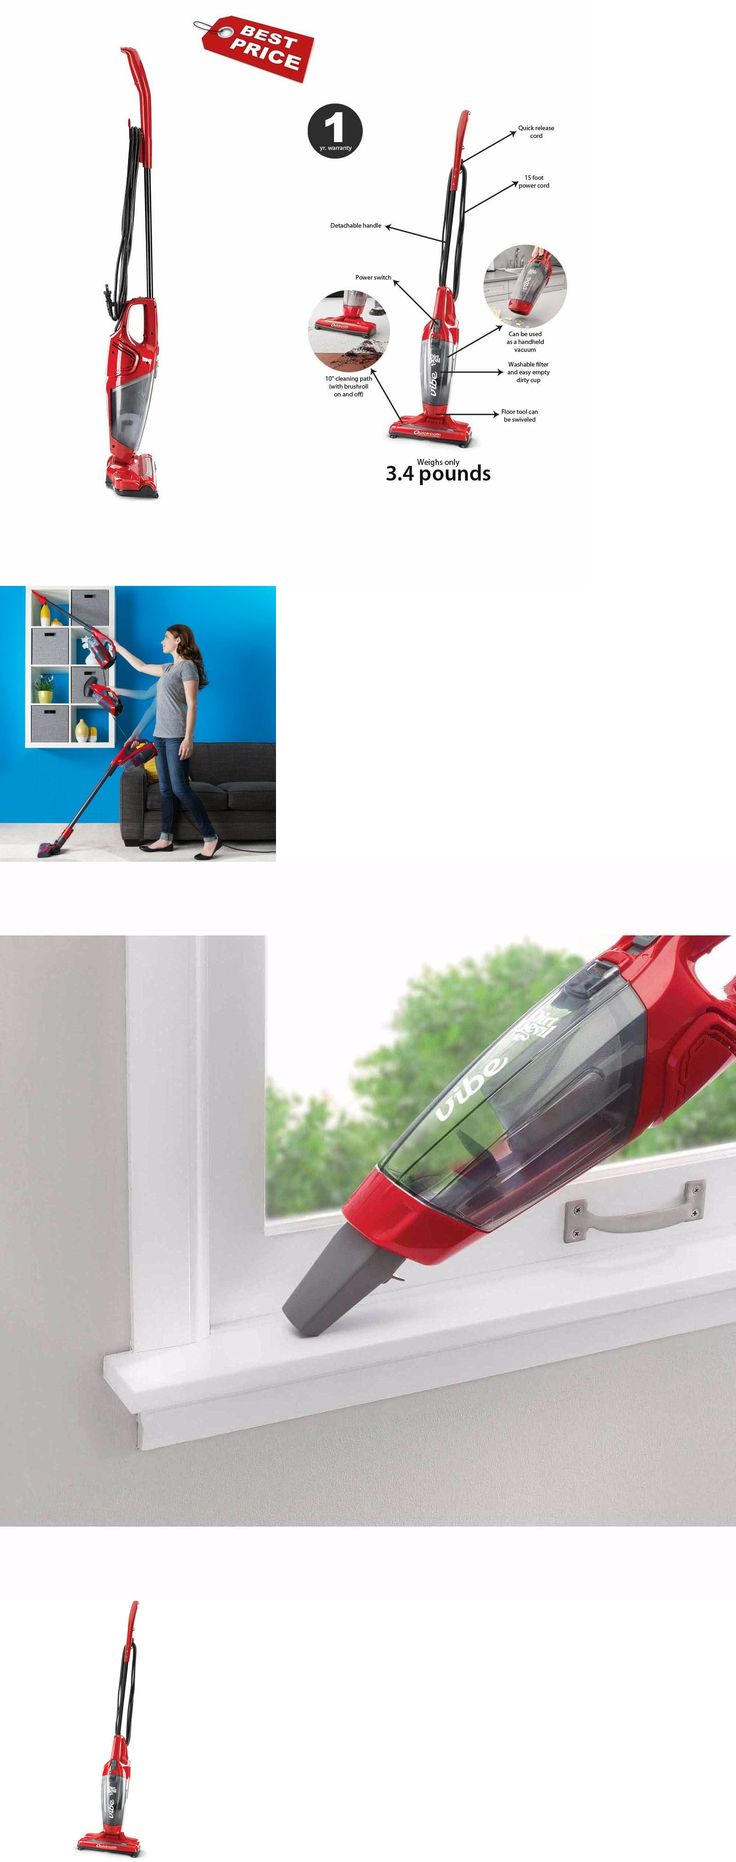 Best 25 Stick Vacuums Ideas On Pinterest Hair Dryer